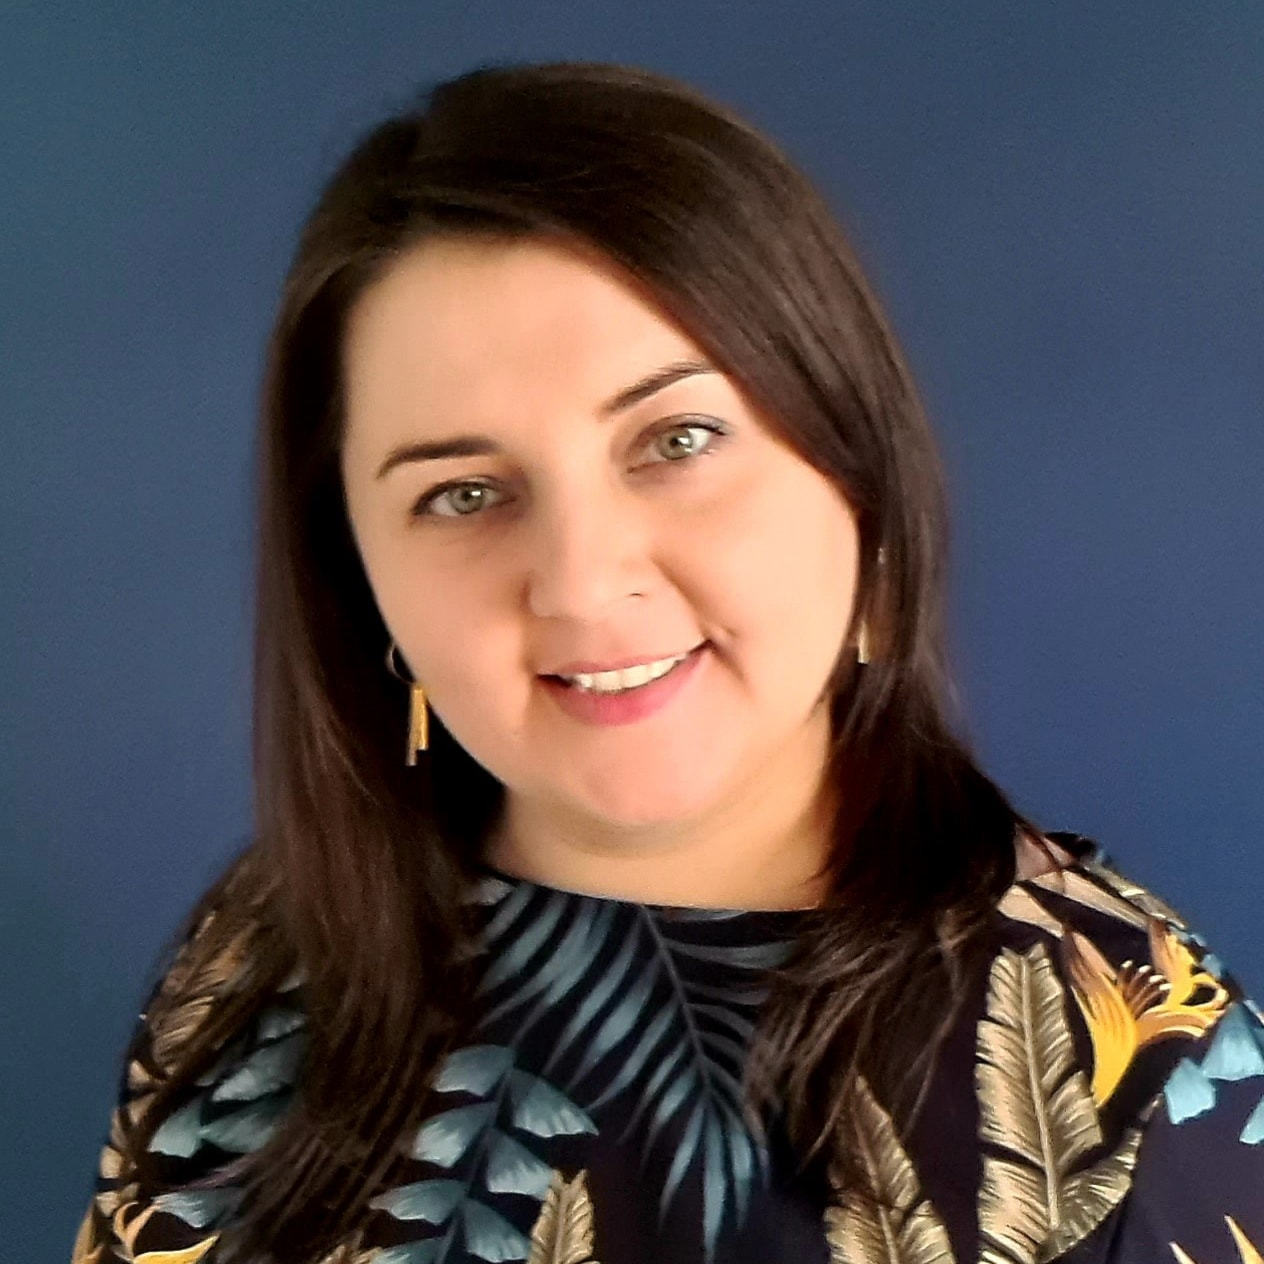 Anna Szymaszek, Specjalista ds. Digital Marketingu MAGNAT